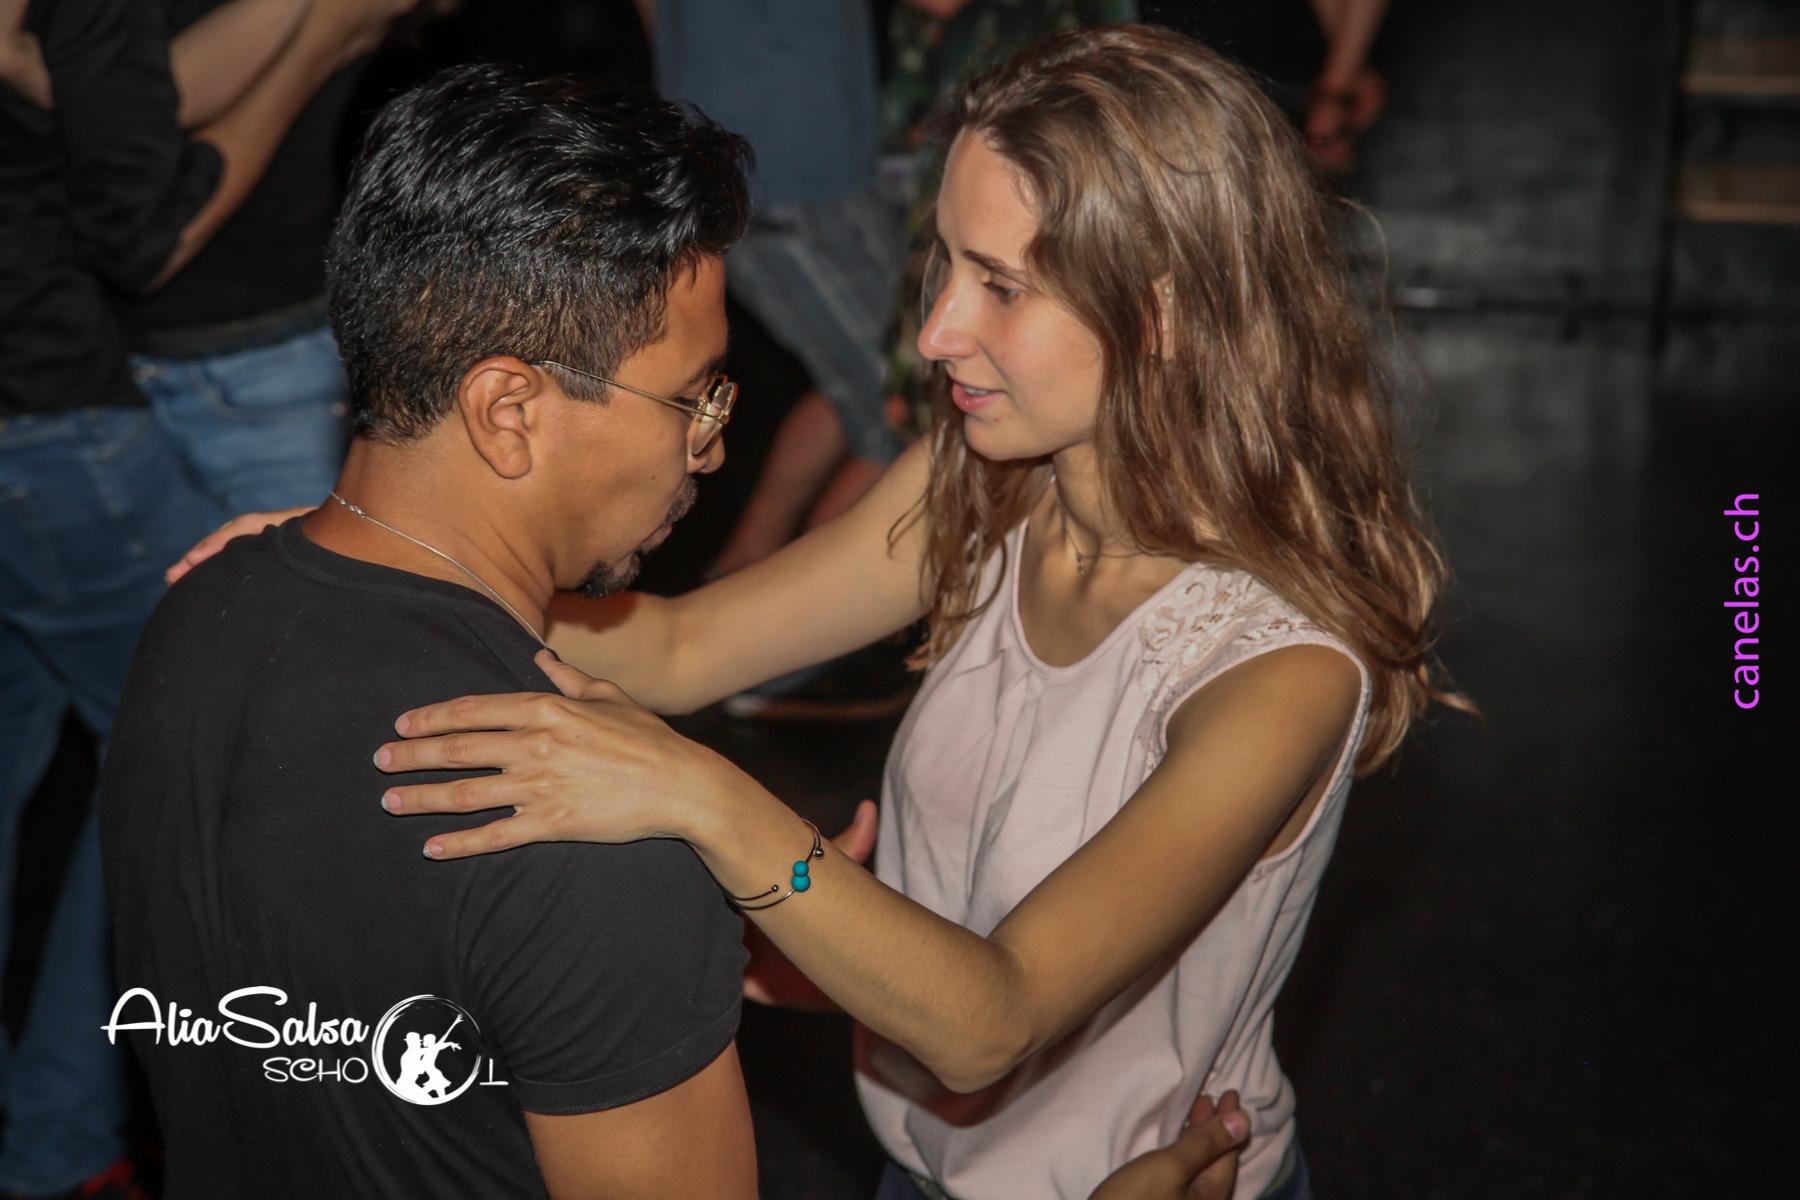 AliaSalsa ecole de danse lausanne soiree bachata salsa cubaineAlia Salsa Soireé Salsa - Bachata-54